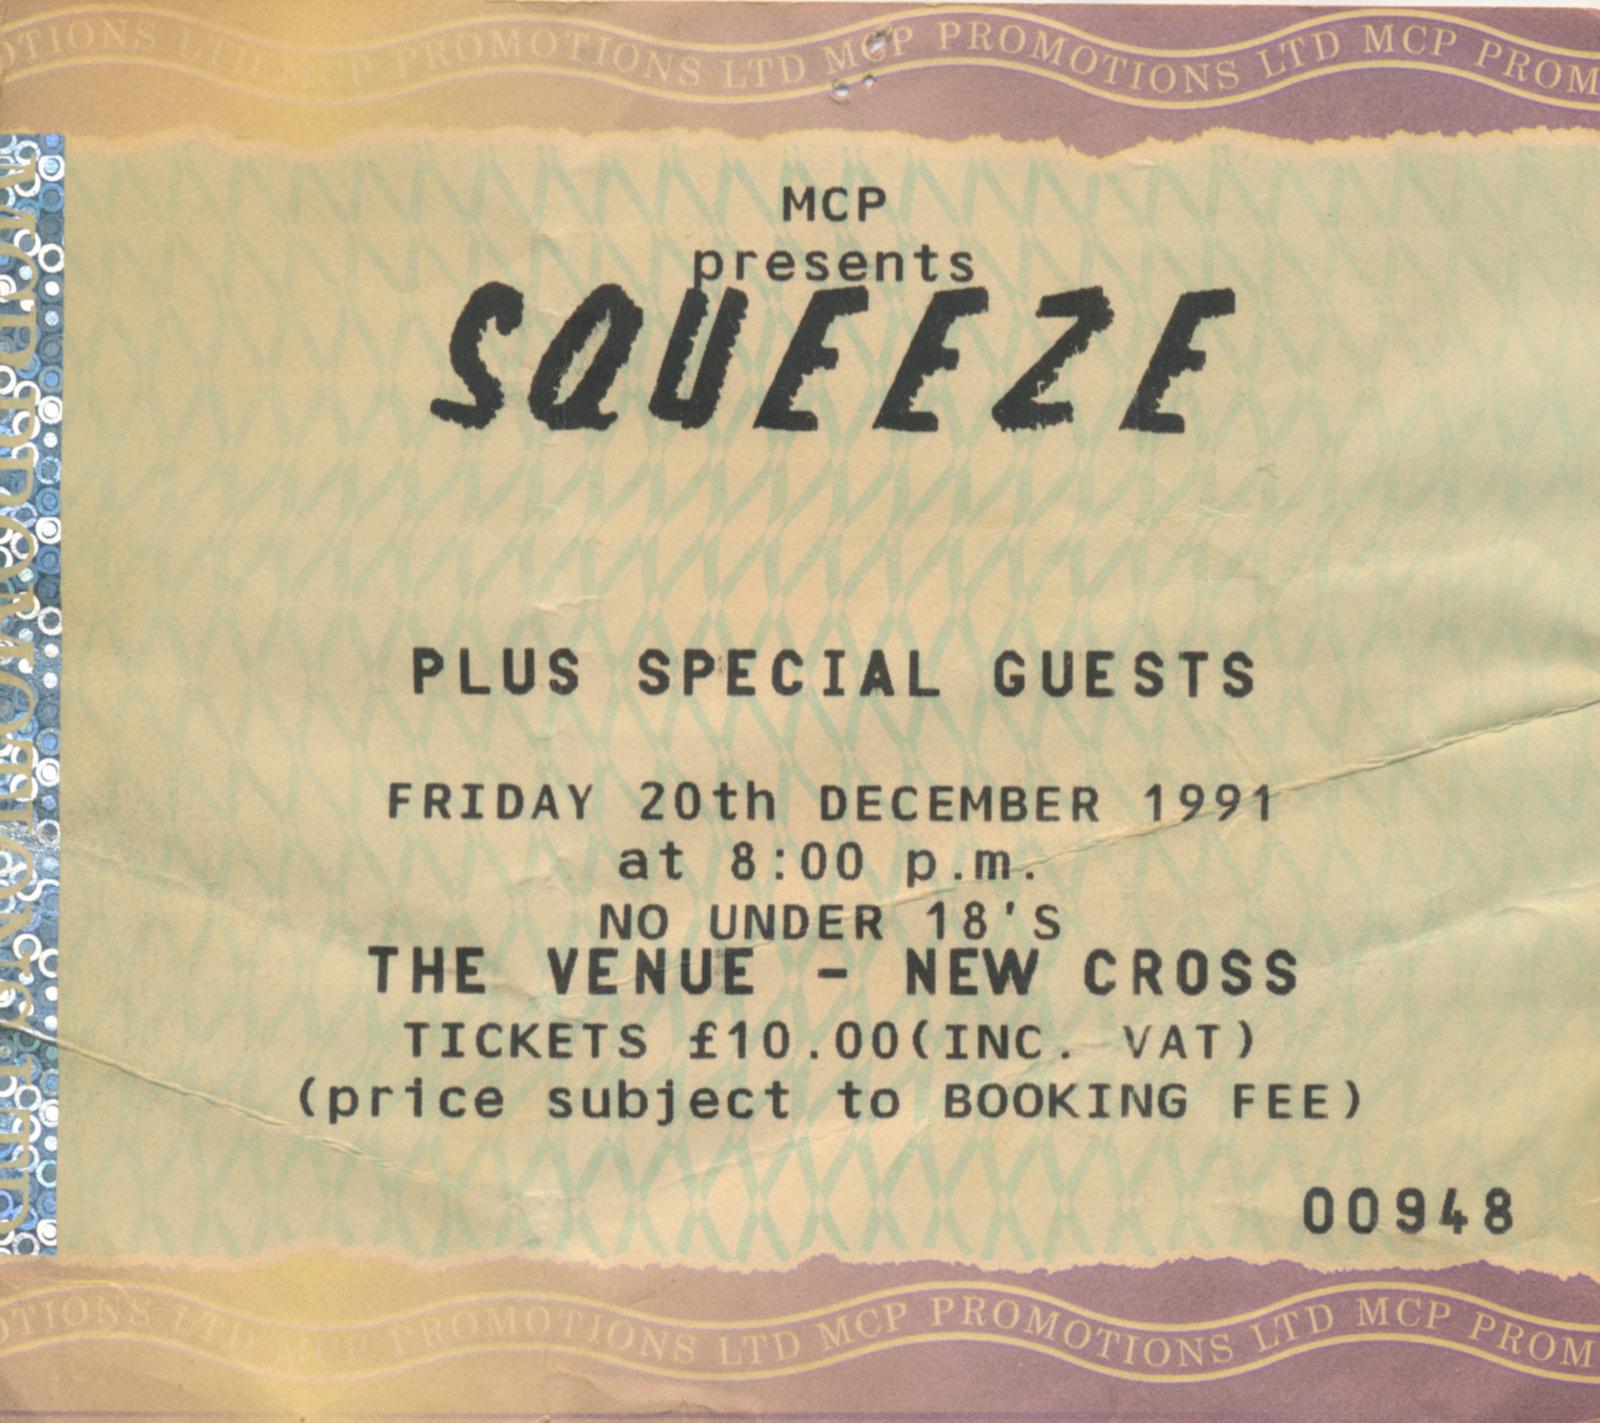 1991-12-20 ticket